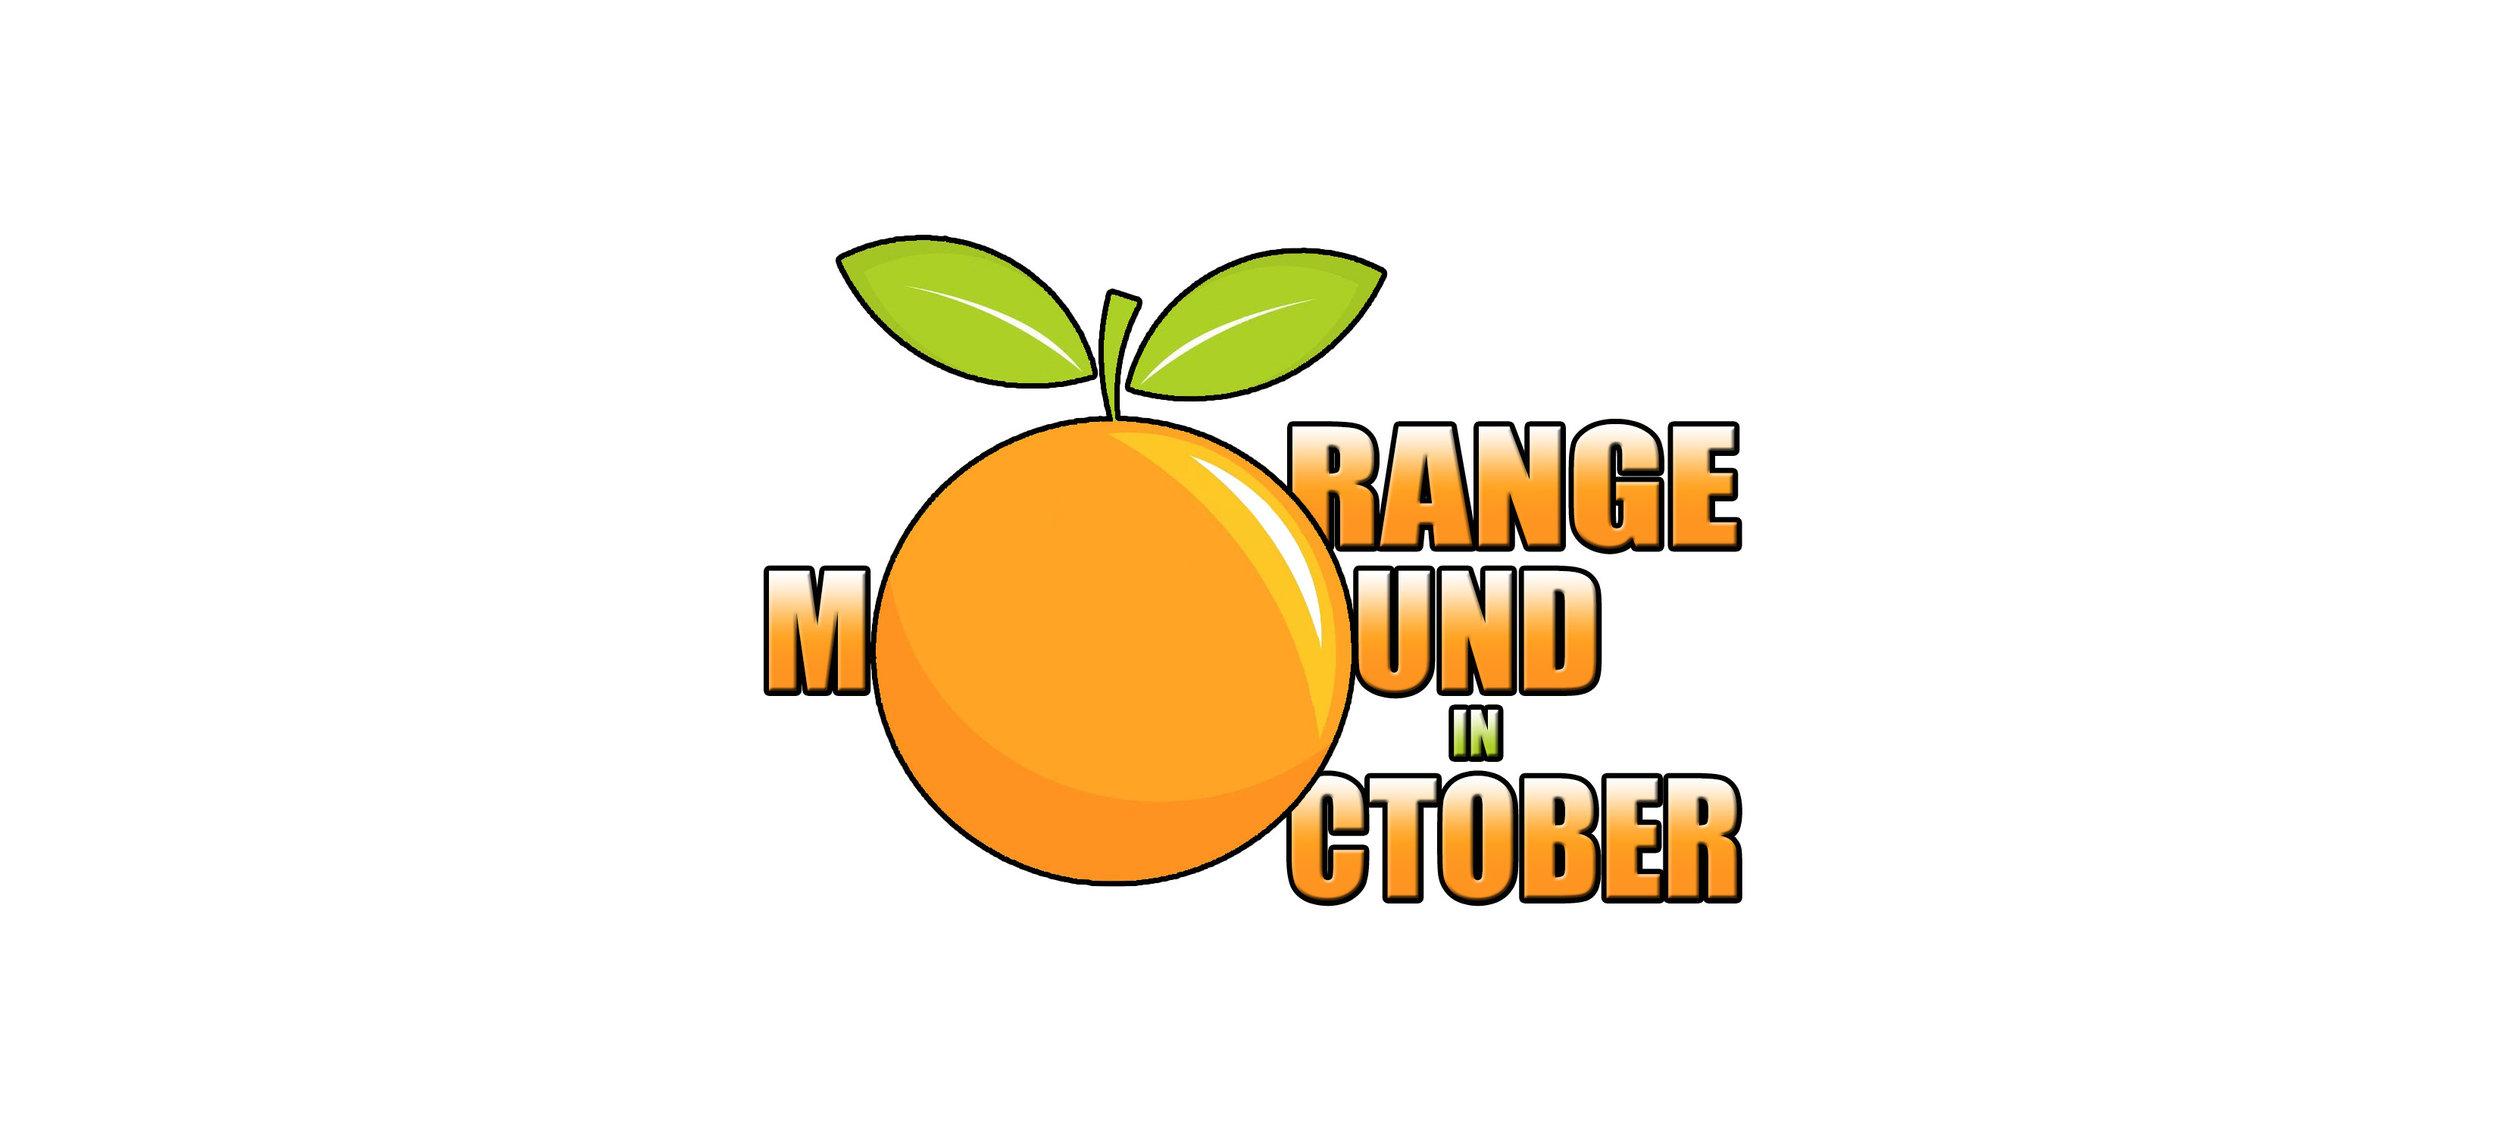 Orange Mound in october 1  (2).jpg